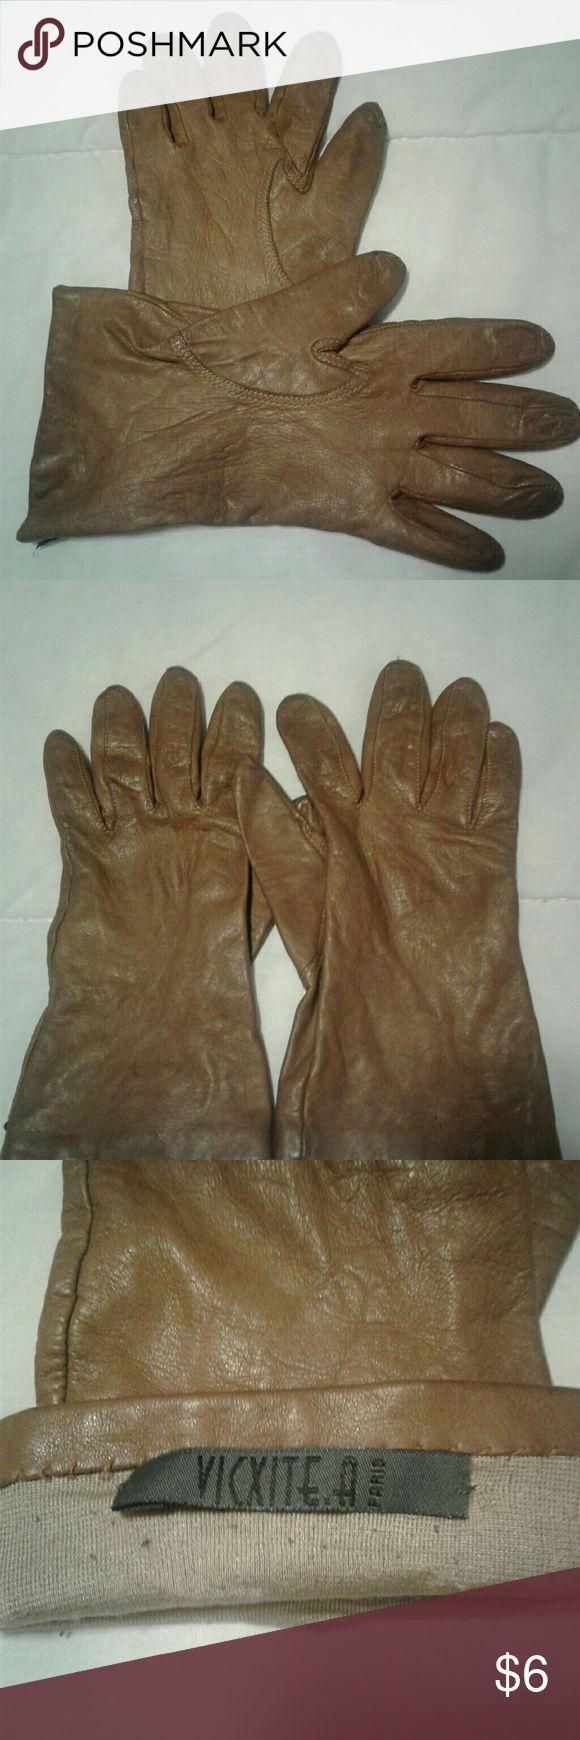 Vintage mens leather gloves - Vintage Women S Brown Leather Gloves Size 7